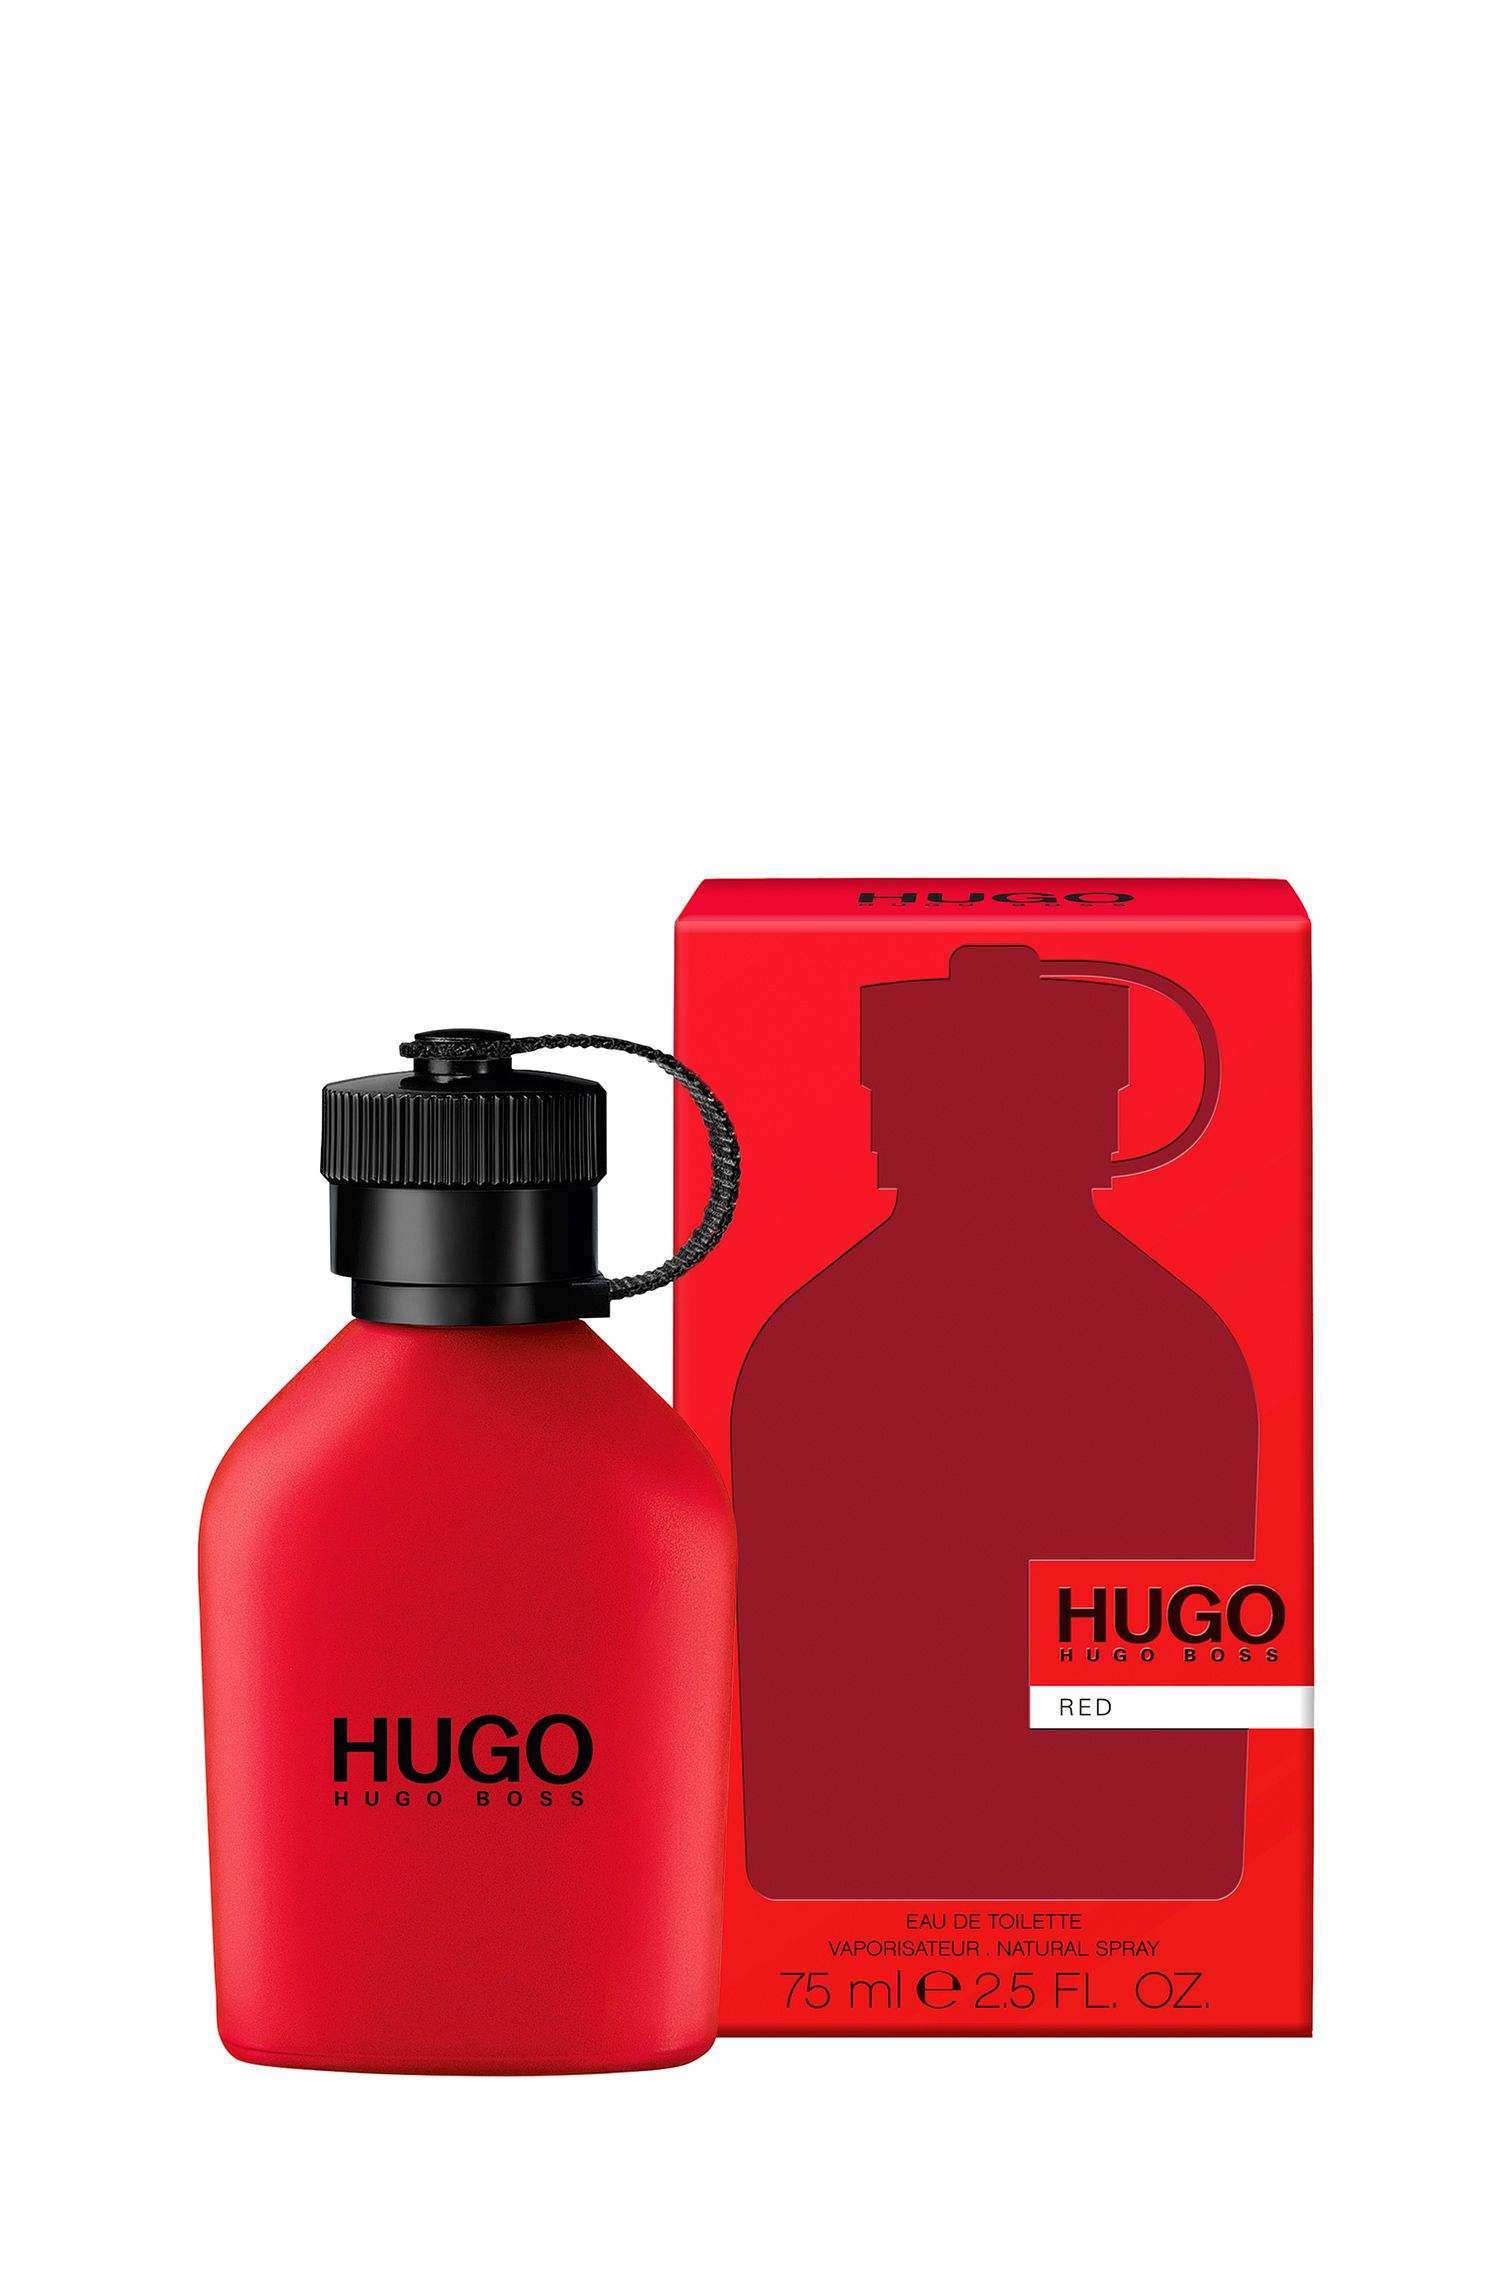 Eau de Toilette HUGO Red, 75ml